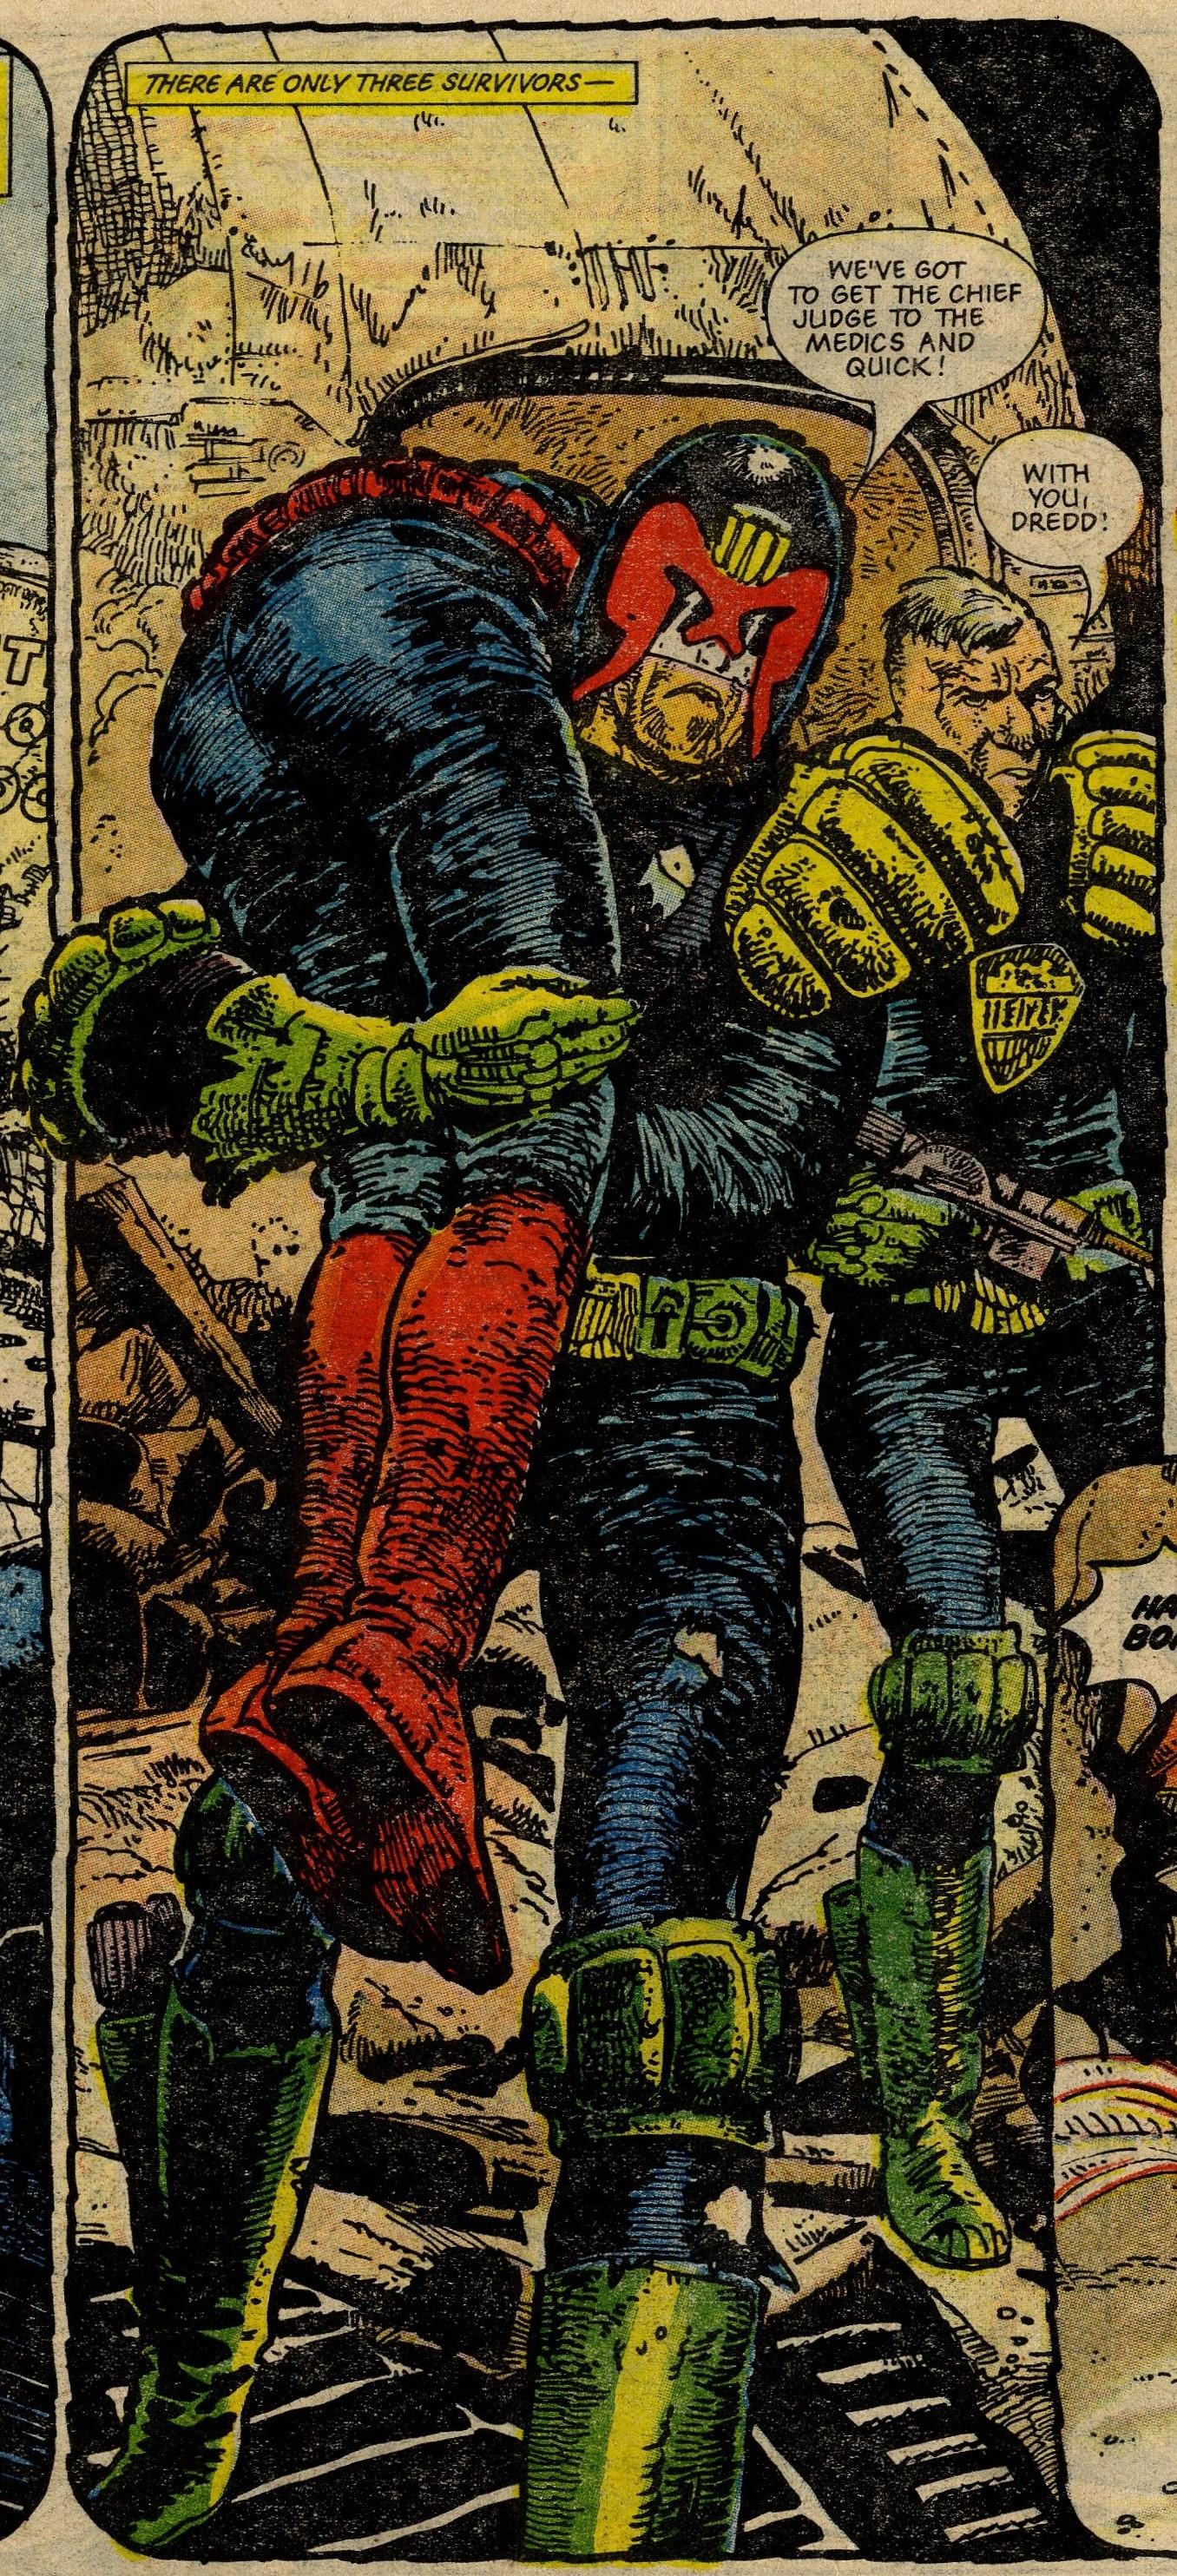 Judge Dredd: The Apocalypse War: John Wagner and Alan Grant (writers), Carlos Ezquerra (artist)